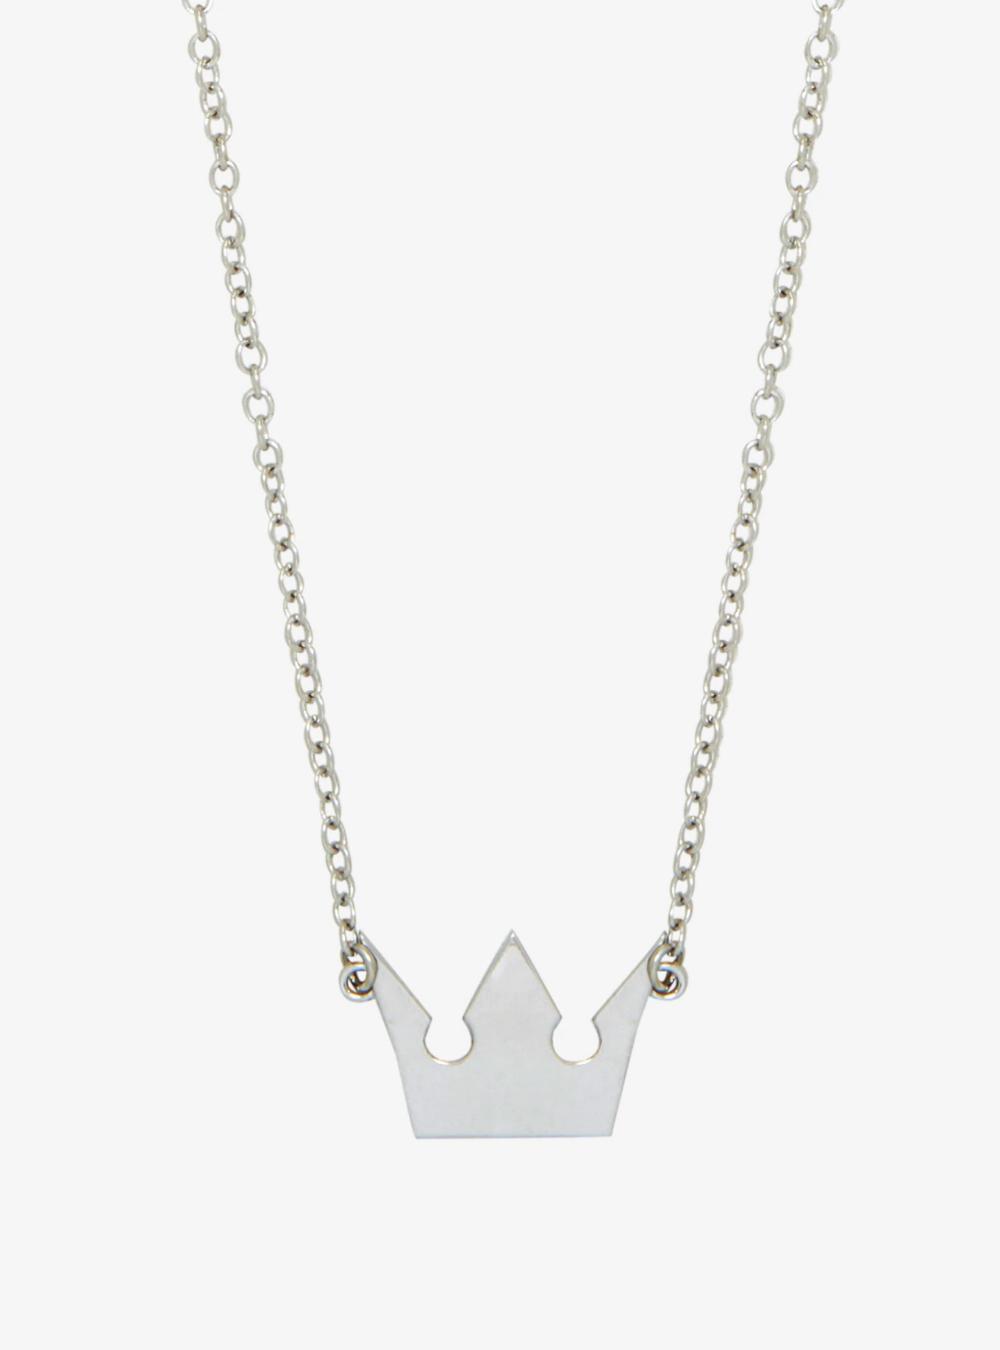 Disney Kingdom Hearts Crown Replica Pendant Necklace Kingdom Hearts Crown Kingdom Hearts Necklace Kingdom Hearts Merchandise